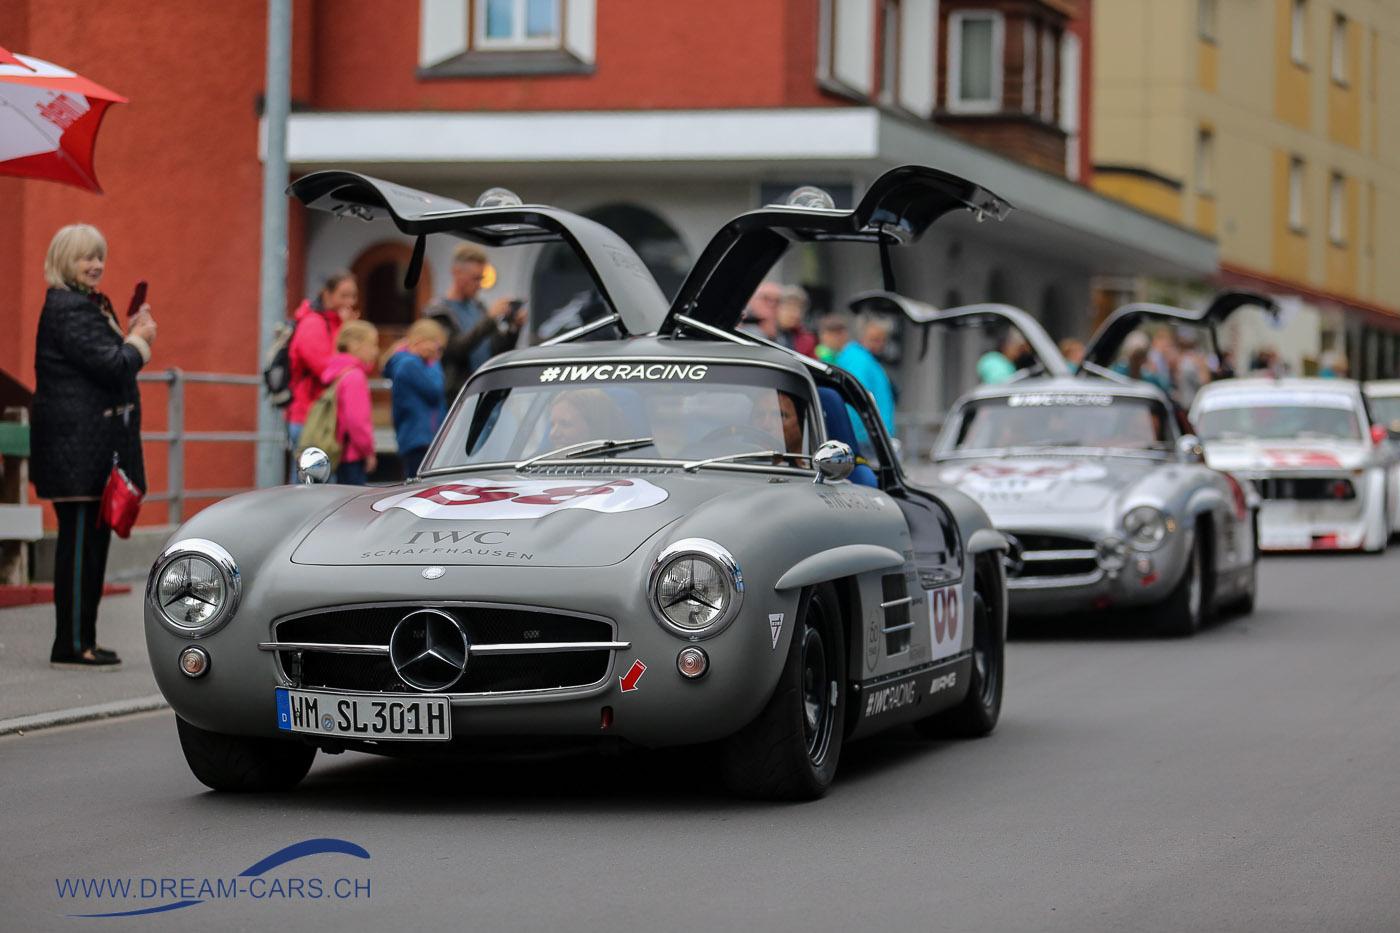 Mercedes 300 SL, Karl Wendlinger, Arosa ClassicCar